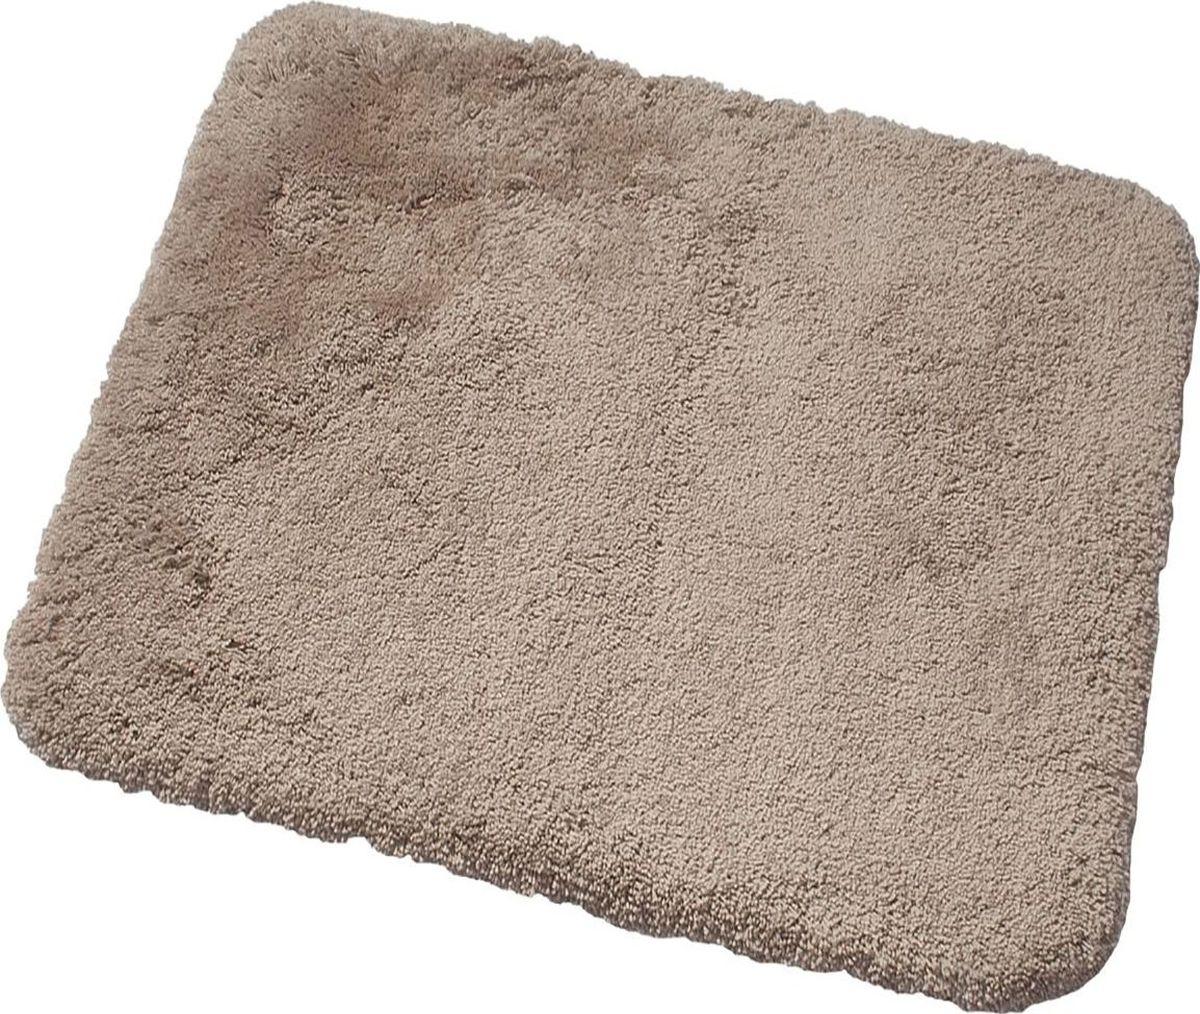 Коврик для ванной Ridder Istanbul, цвет: бежевый, коричневый, 60 х 50 см коврик для ванной комнаты ridder istanbul 790317 60х90см